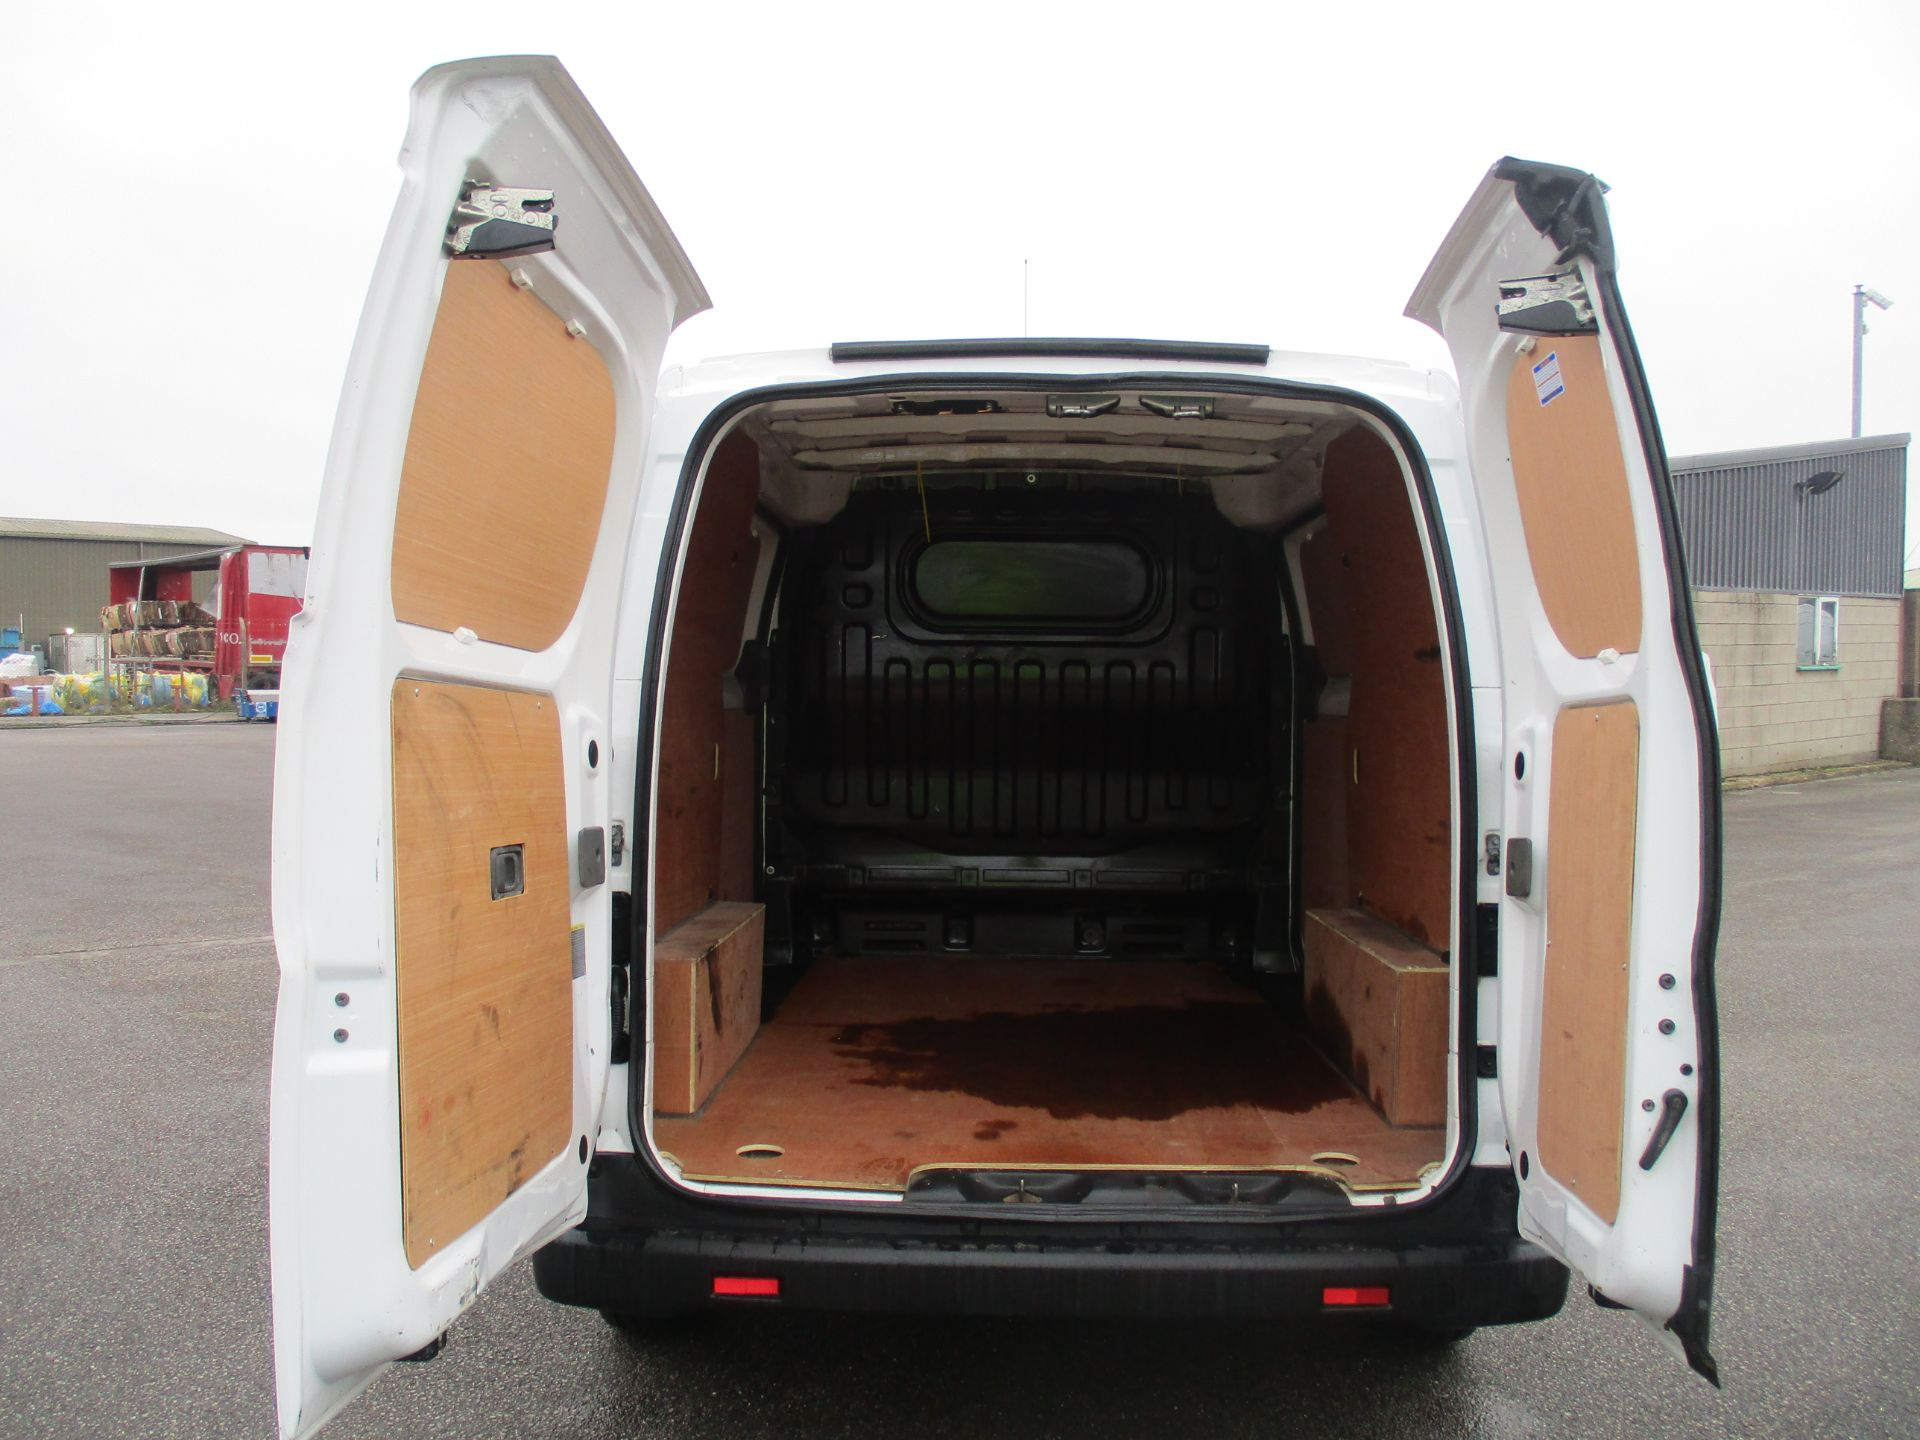 2014 Nissan Nv200 1.5 DCI ACENTA EURO 5 (SJ14YBR) Image 10